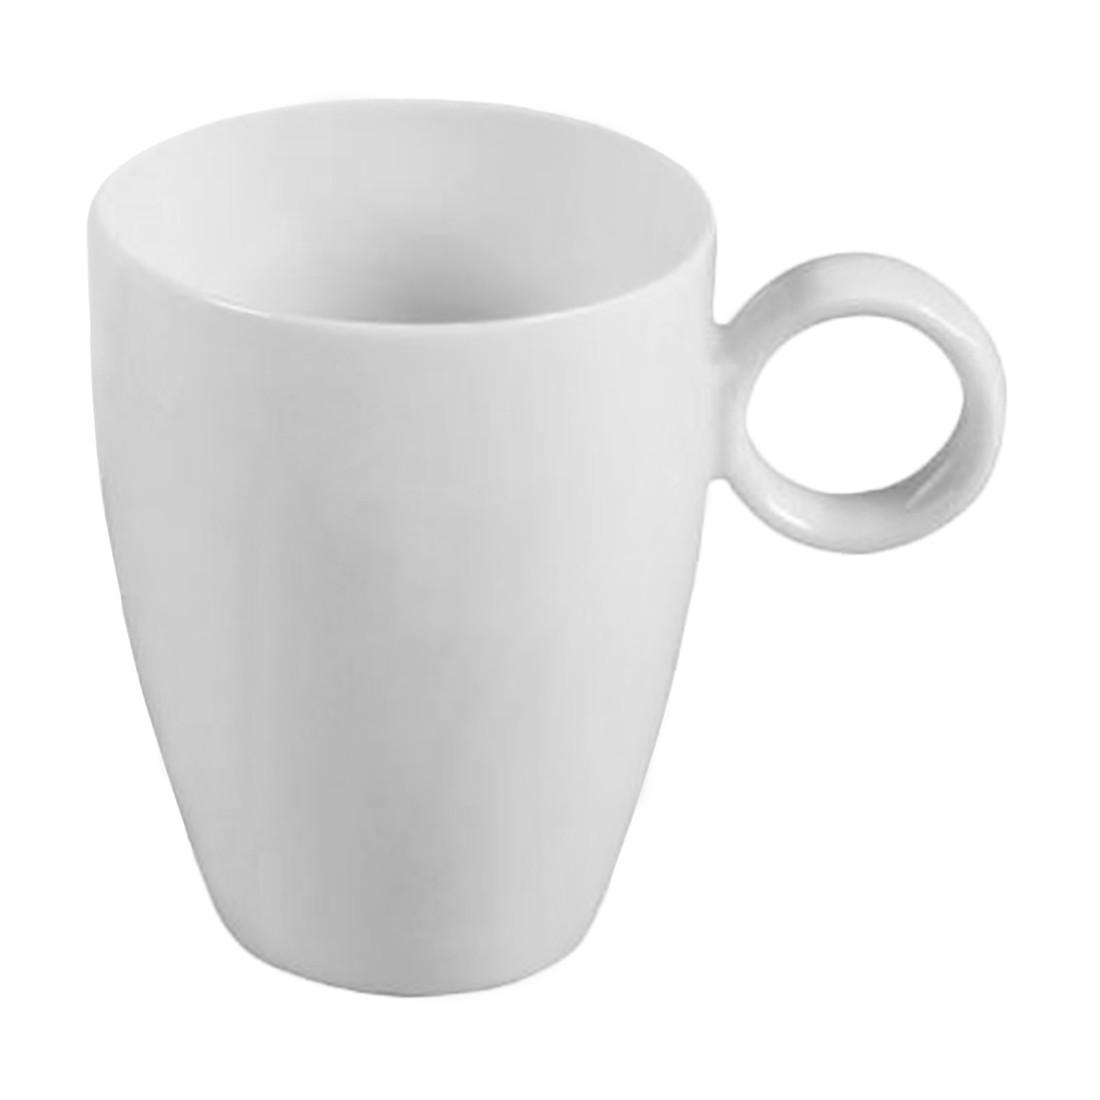 kaffeebecher vario pure 6er set porzellan wei thomas online bestellen. Black Bedroom Furniture Sets. Home Design Ideas